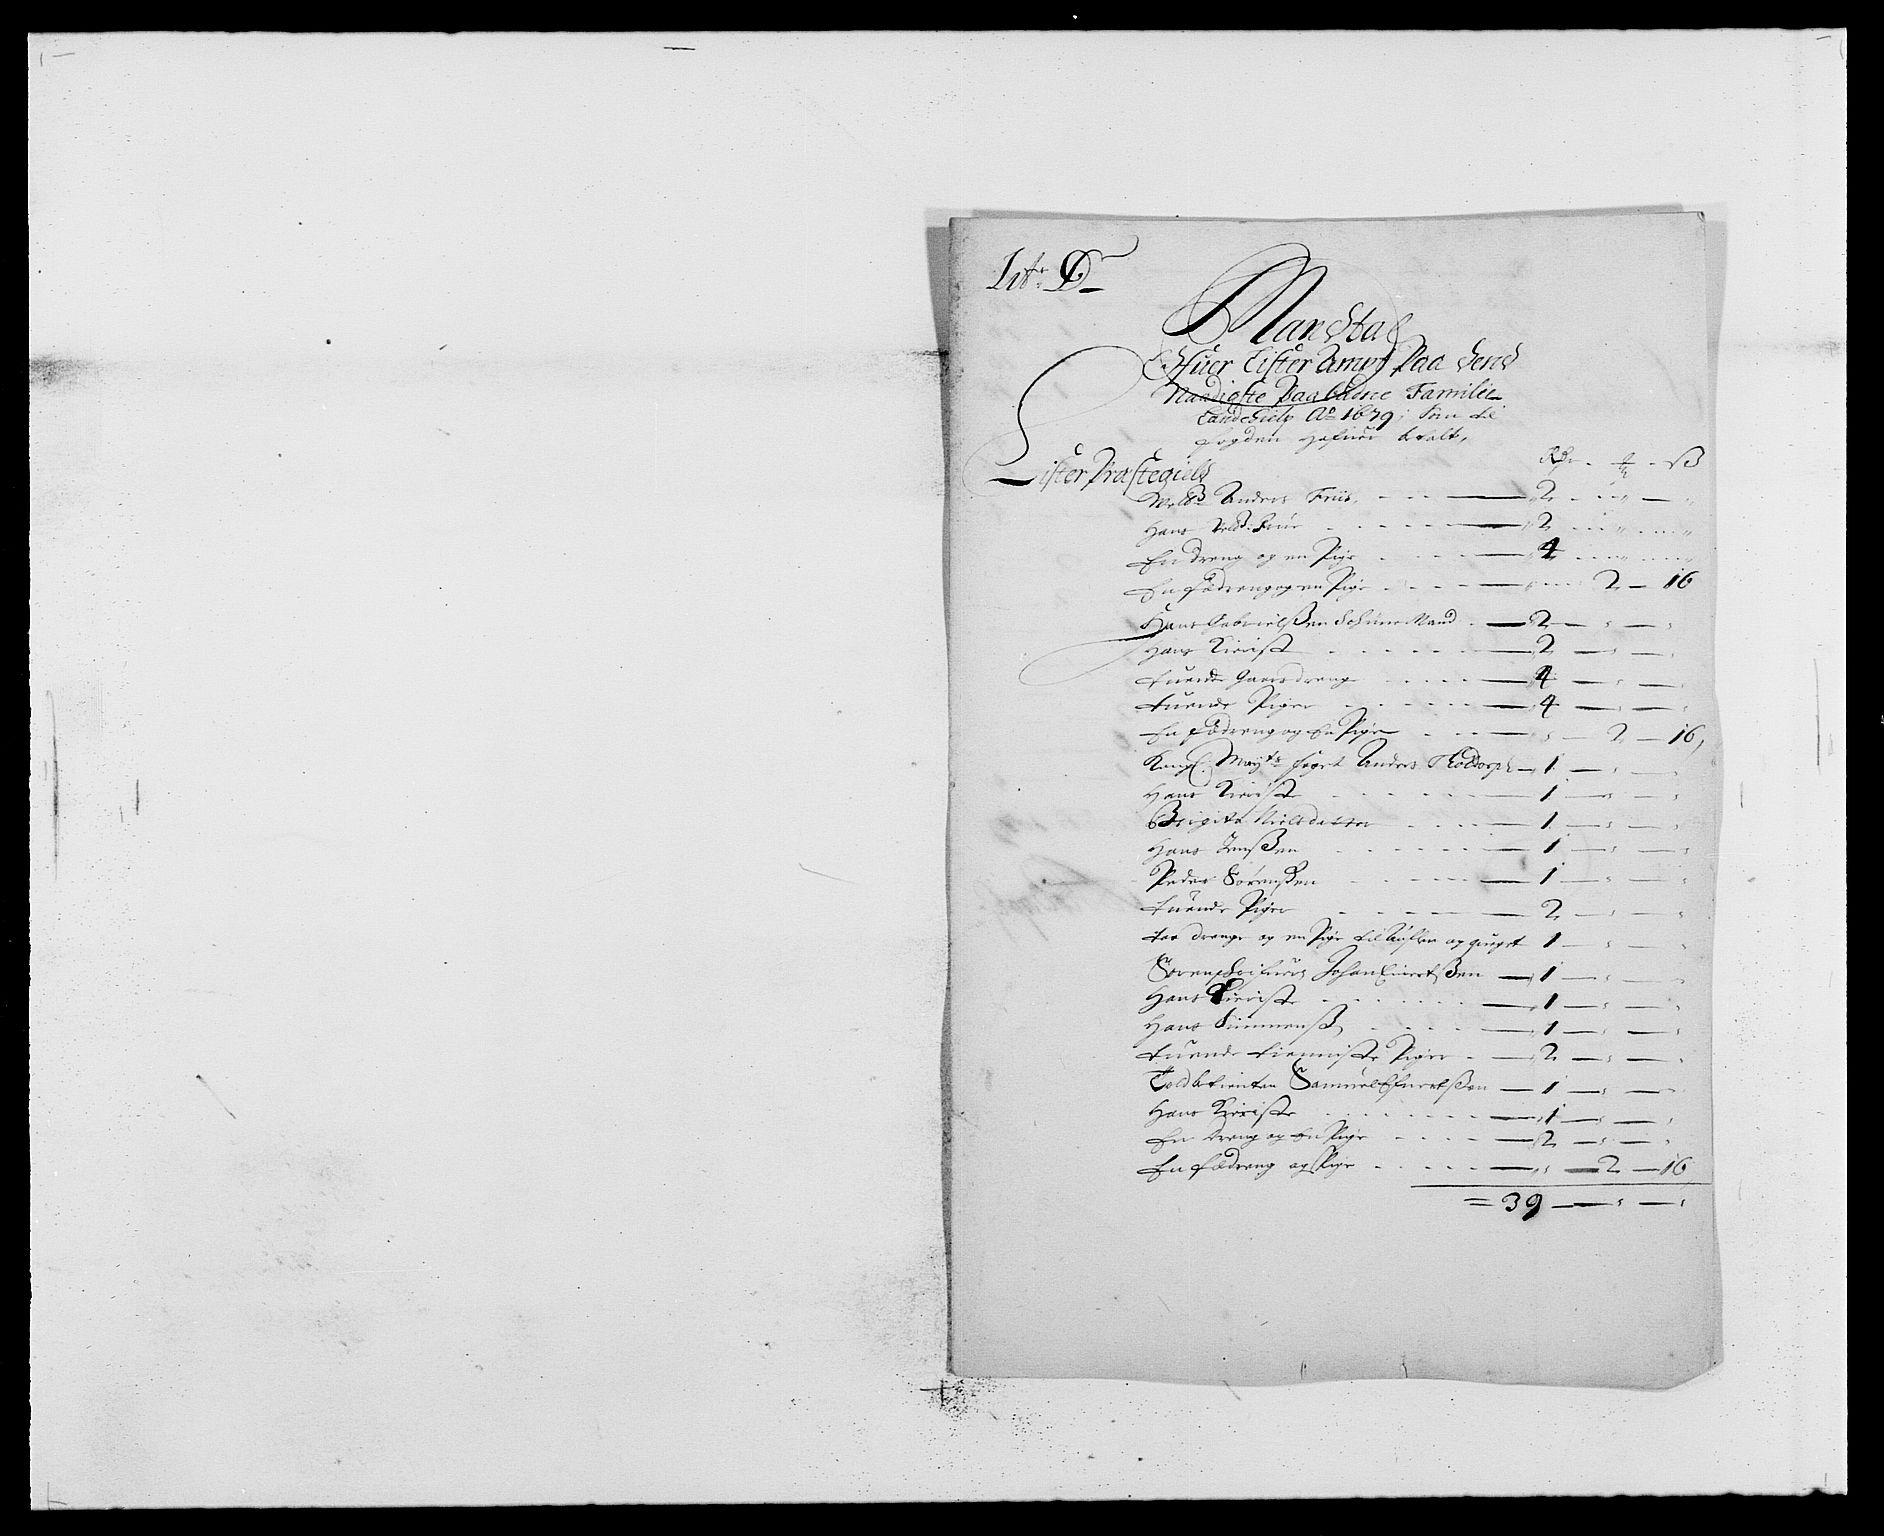 RA, Rentekammeret inntil 1814, Reviderte regnskaper, Fogderegnskap, R41/L2530: Fogderegnskap Lista, 1677-1679, s. 364